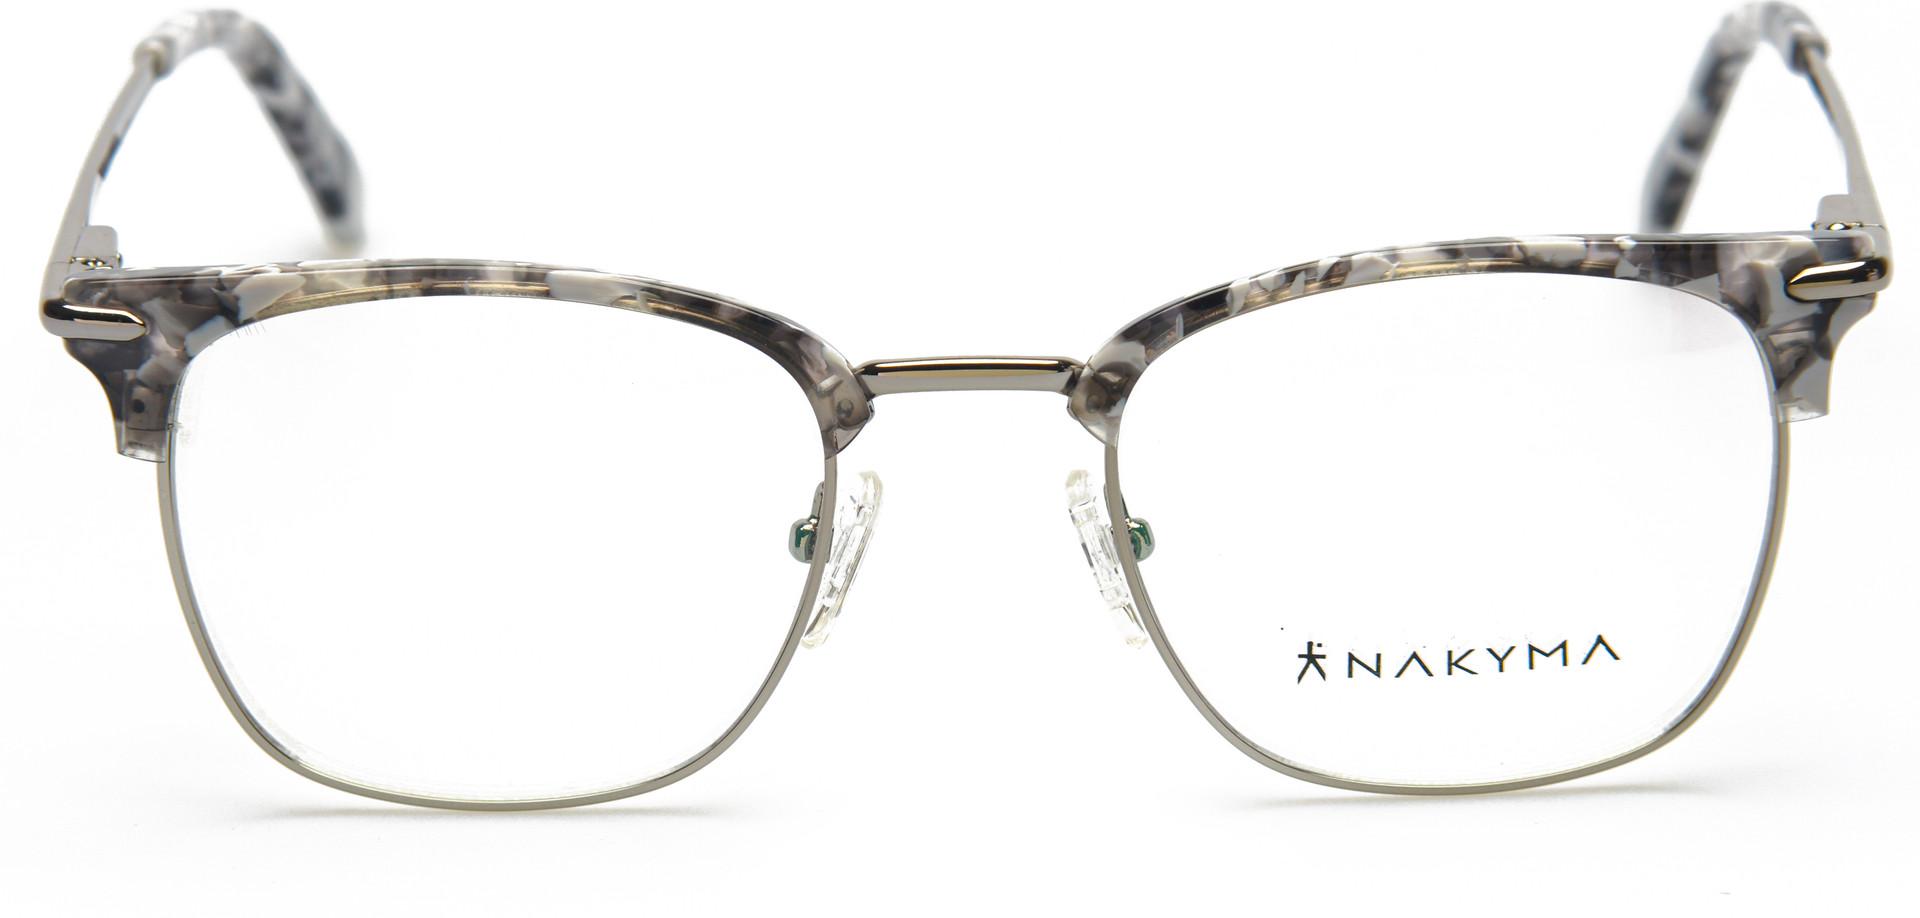 8R1-NAKYMA-V08-C1